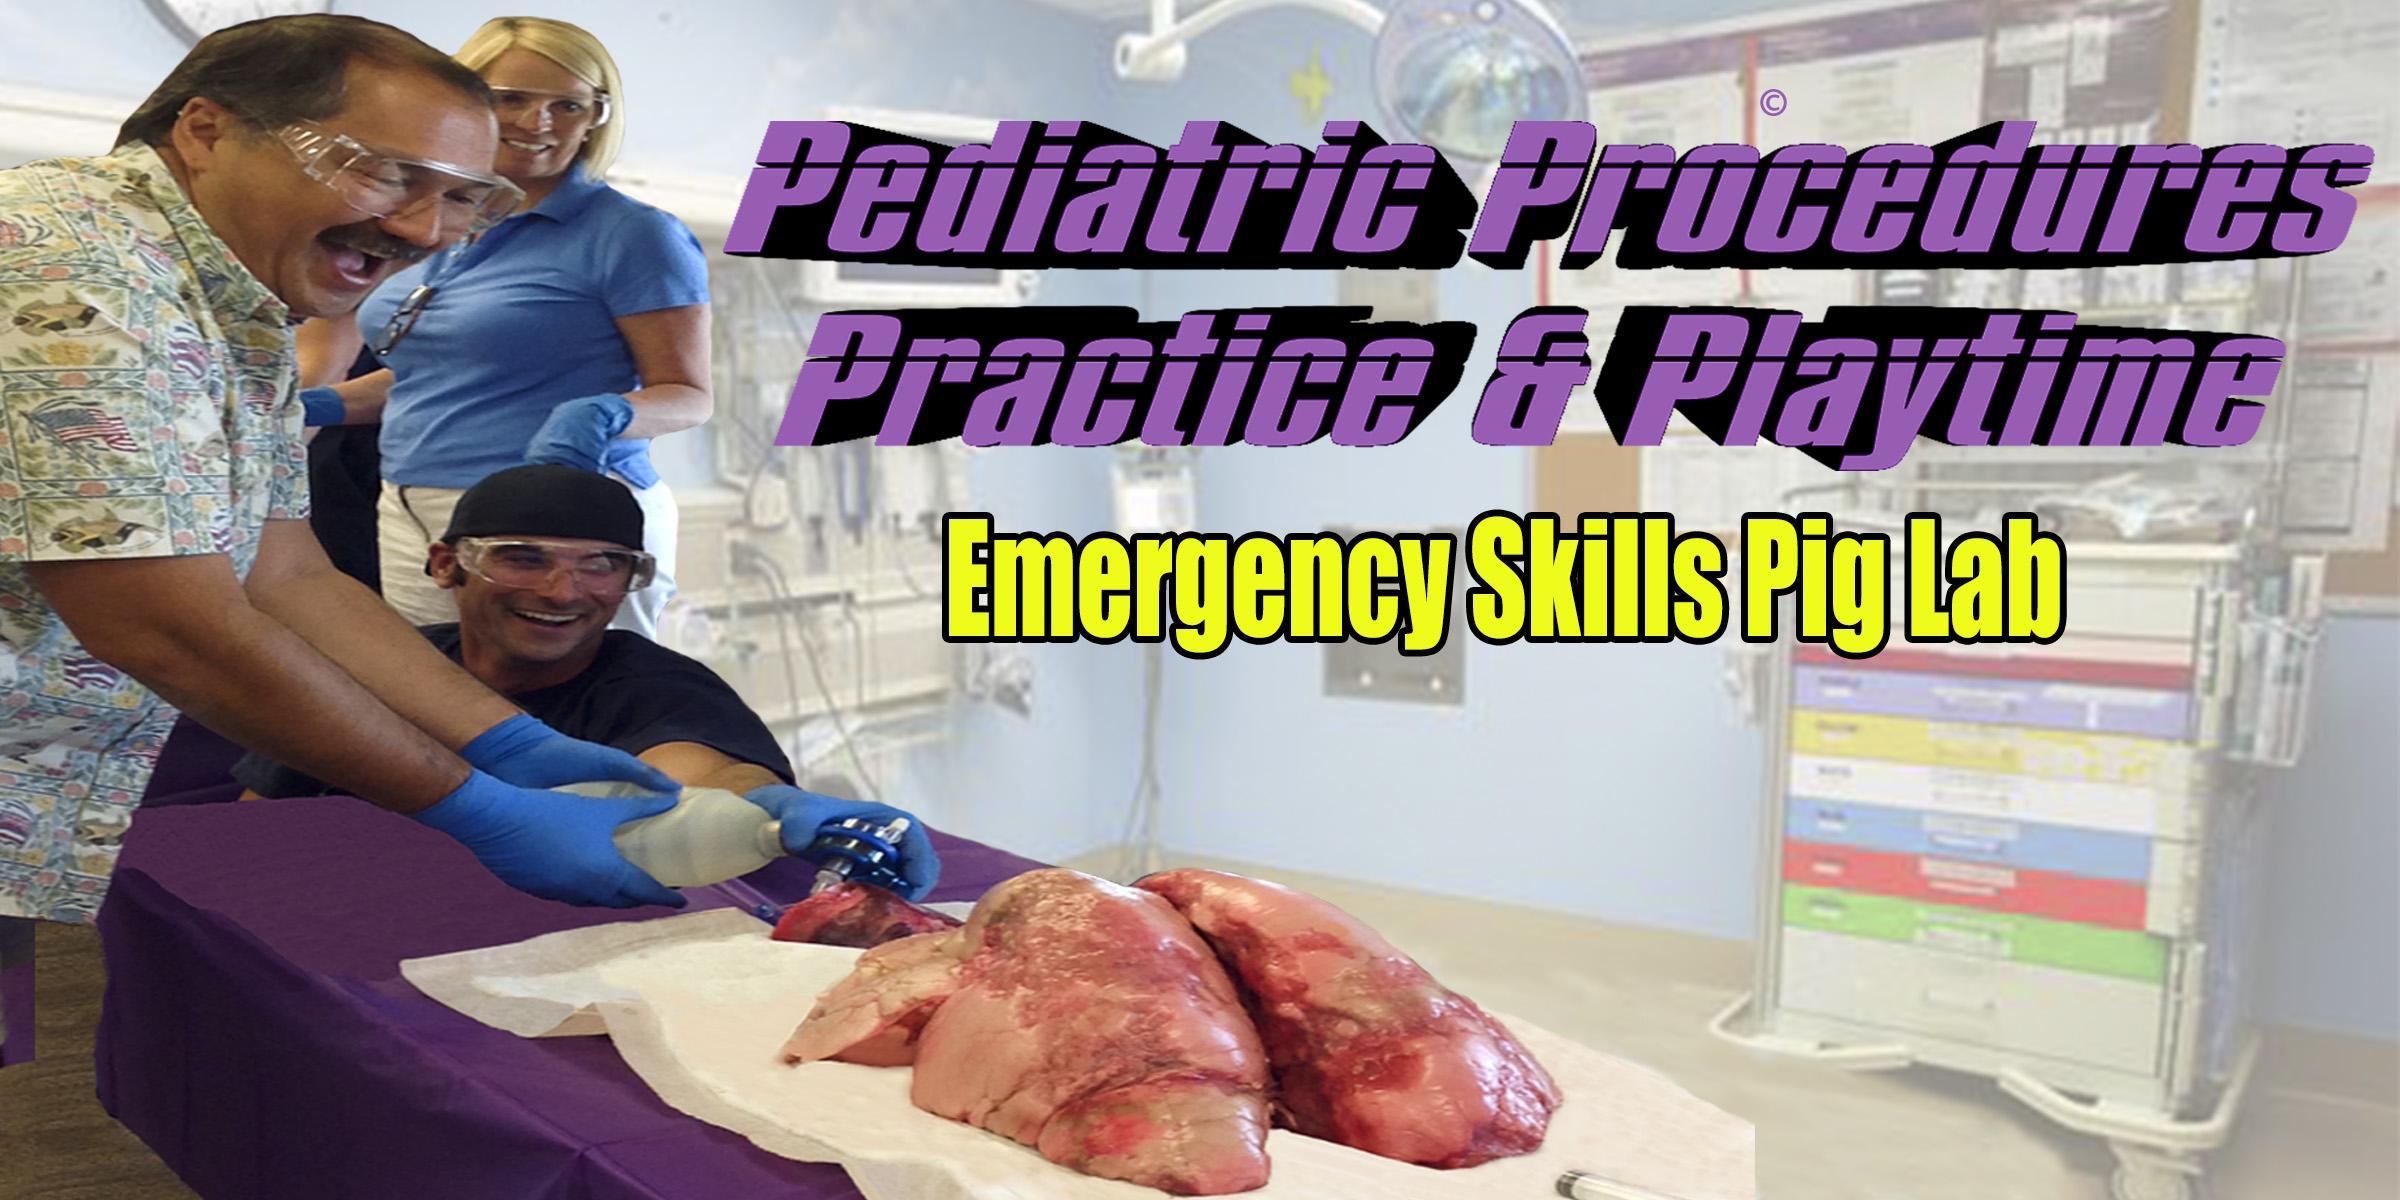 Lexington, Kentucky - Pediatric Procedures, P